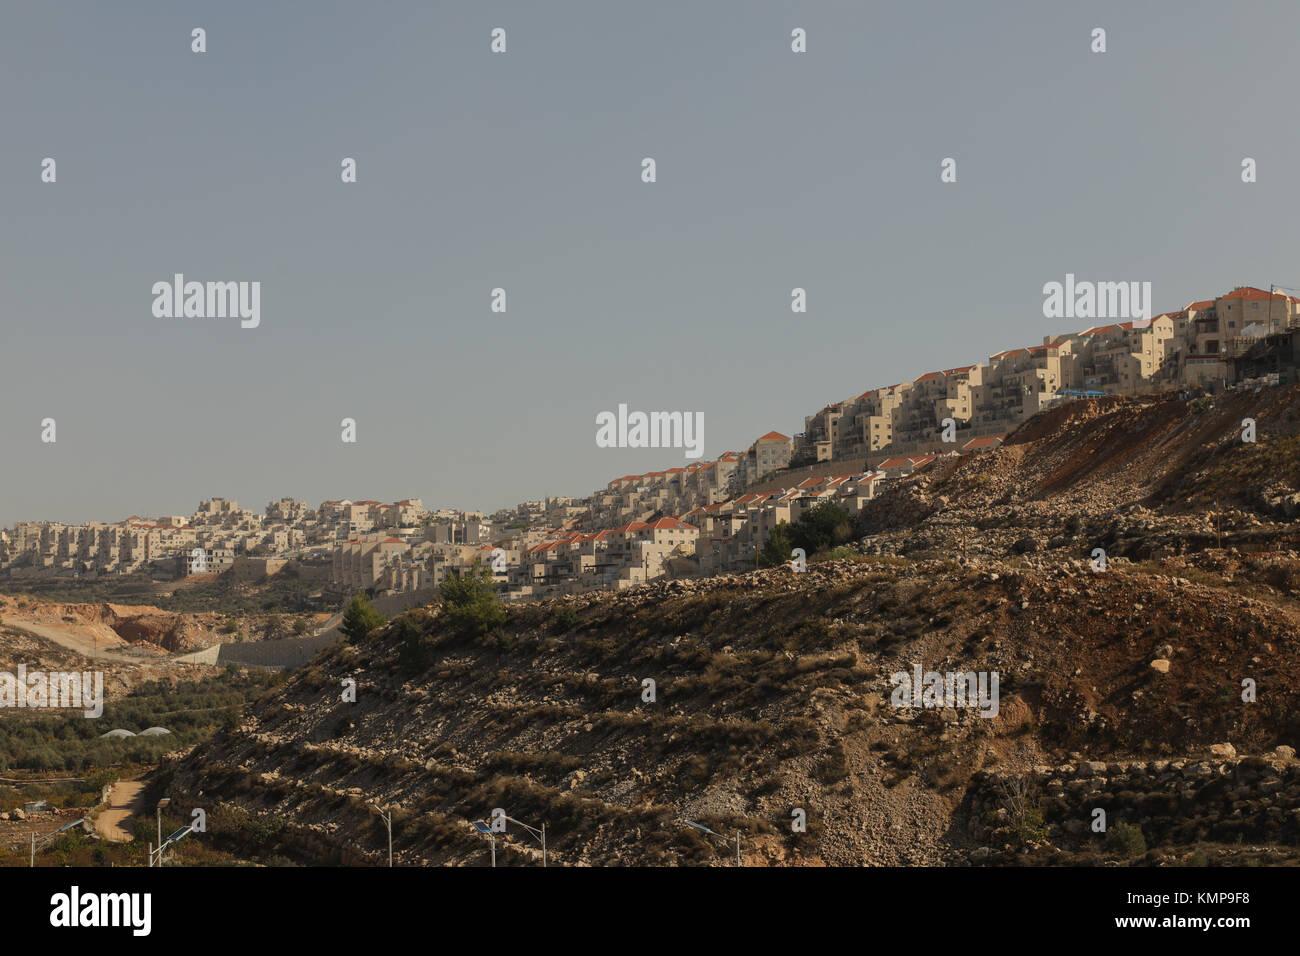 Israeli settlements,Wadi Fukin, Palestine, West Bank, Israel, Middle East. Stock Photo